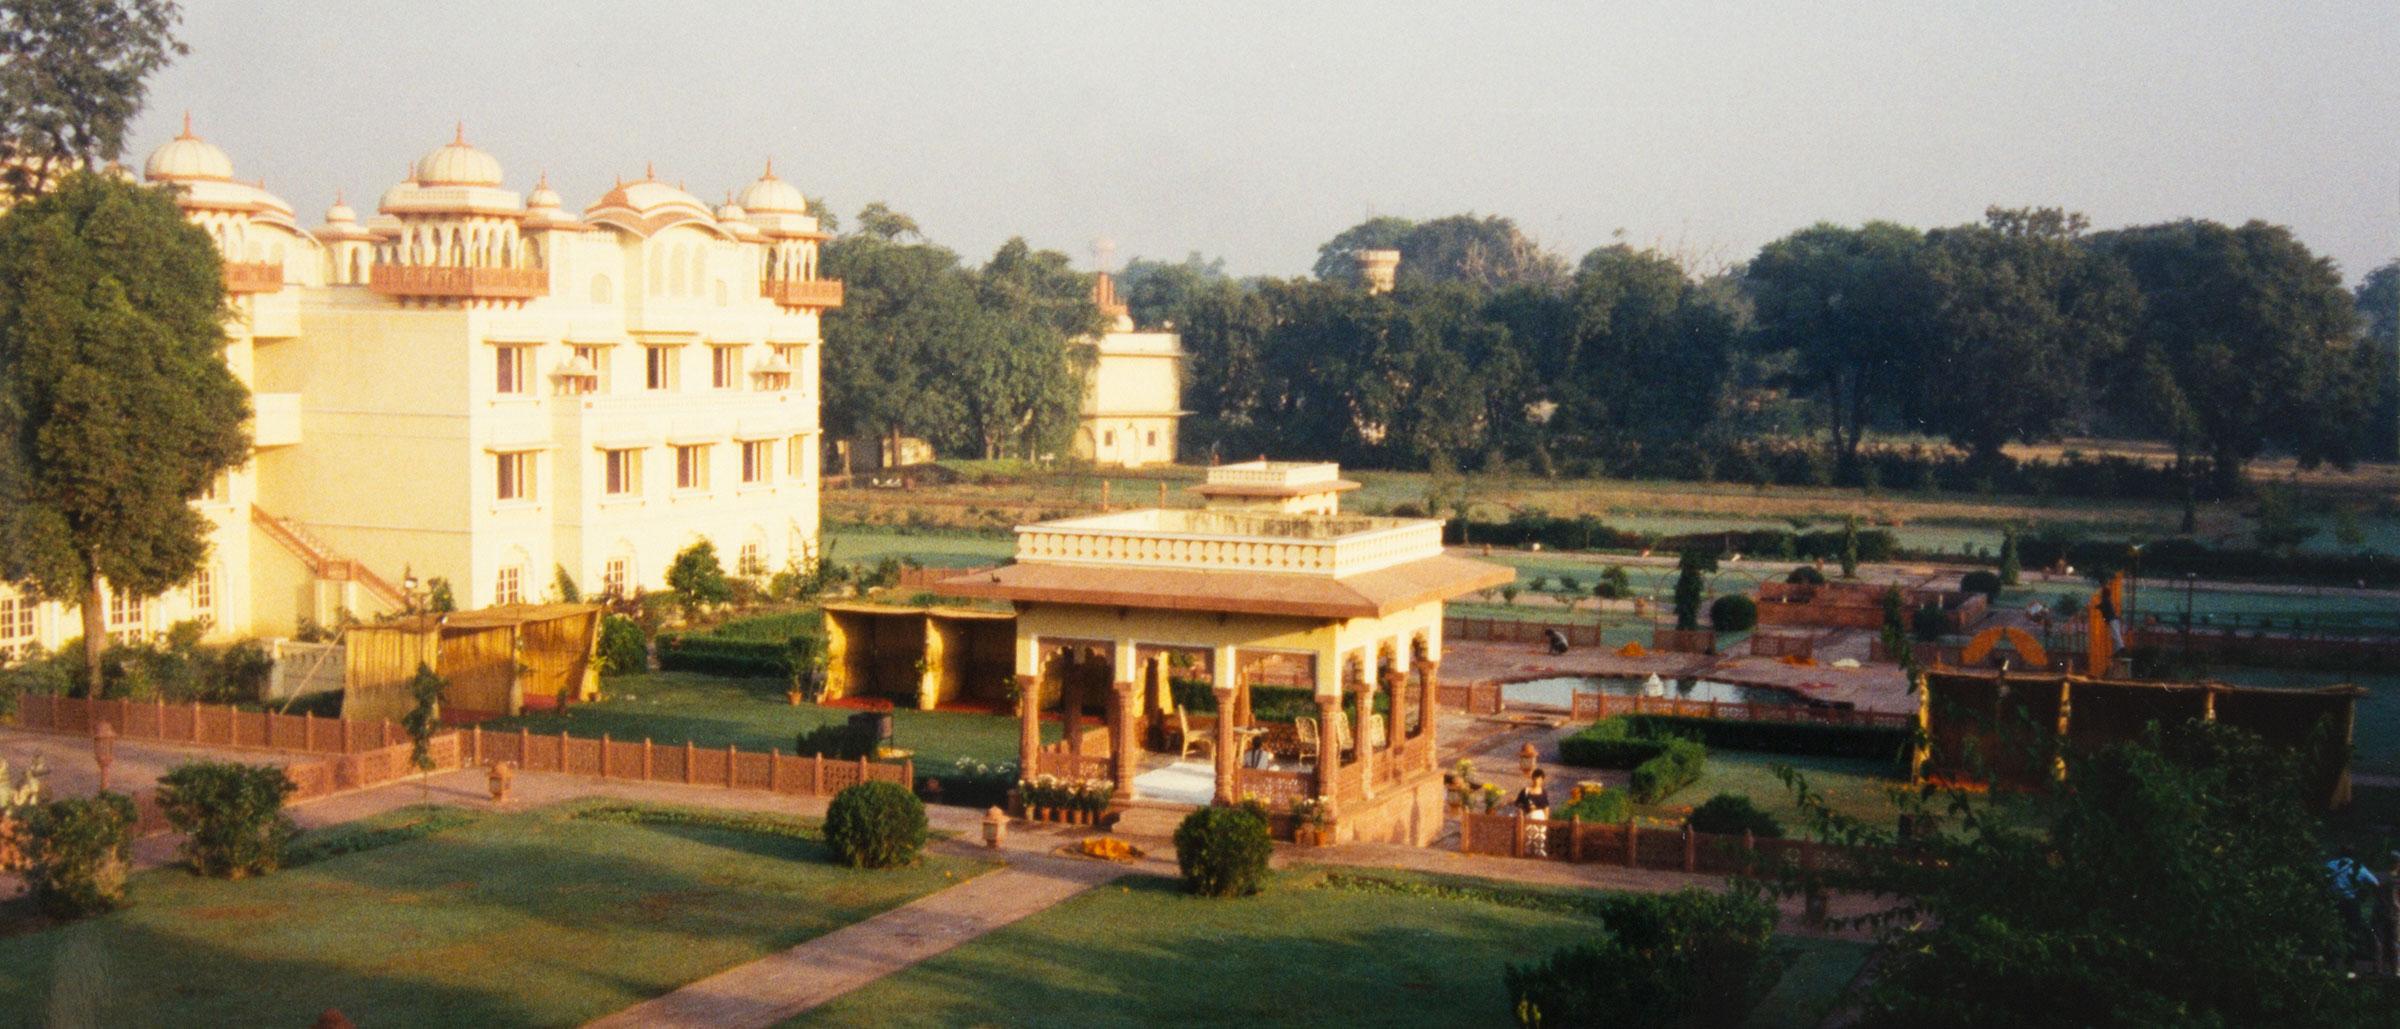 The Jai Mahal Garden in Jaipur